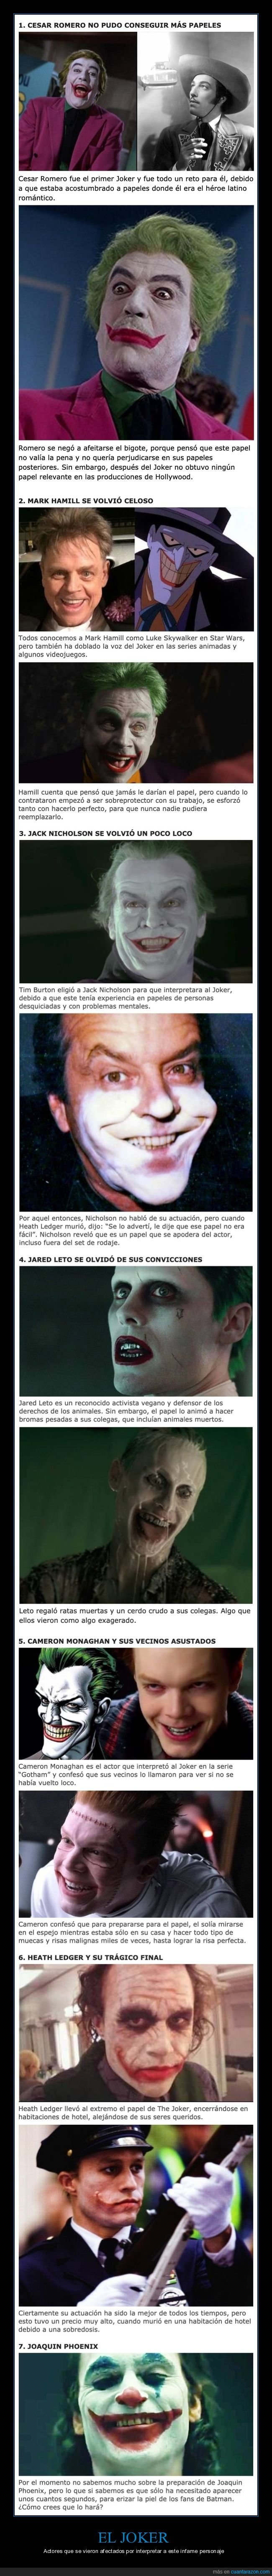 actores,batman,interpretar,joker